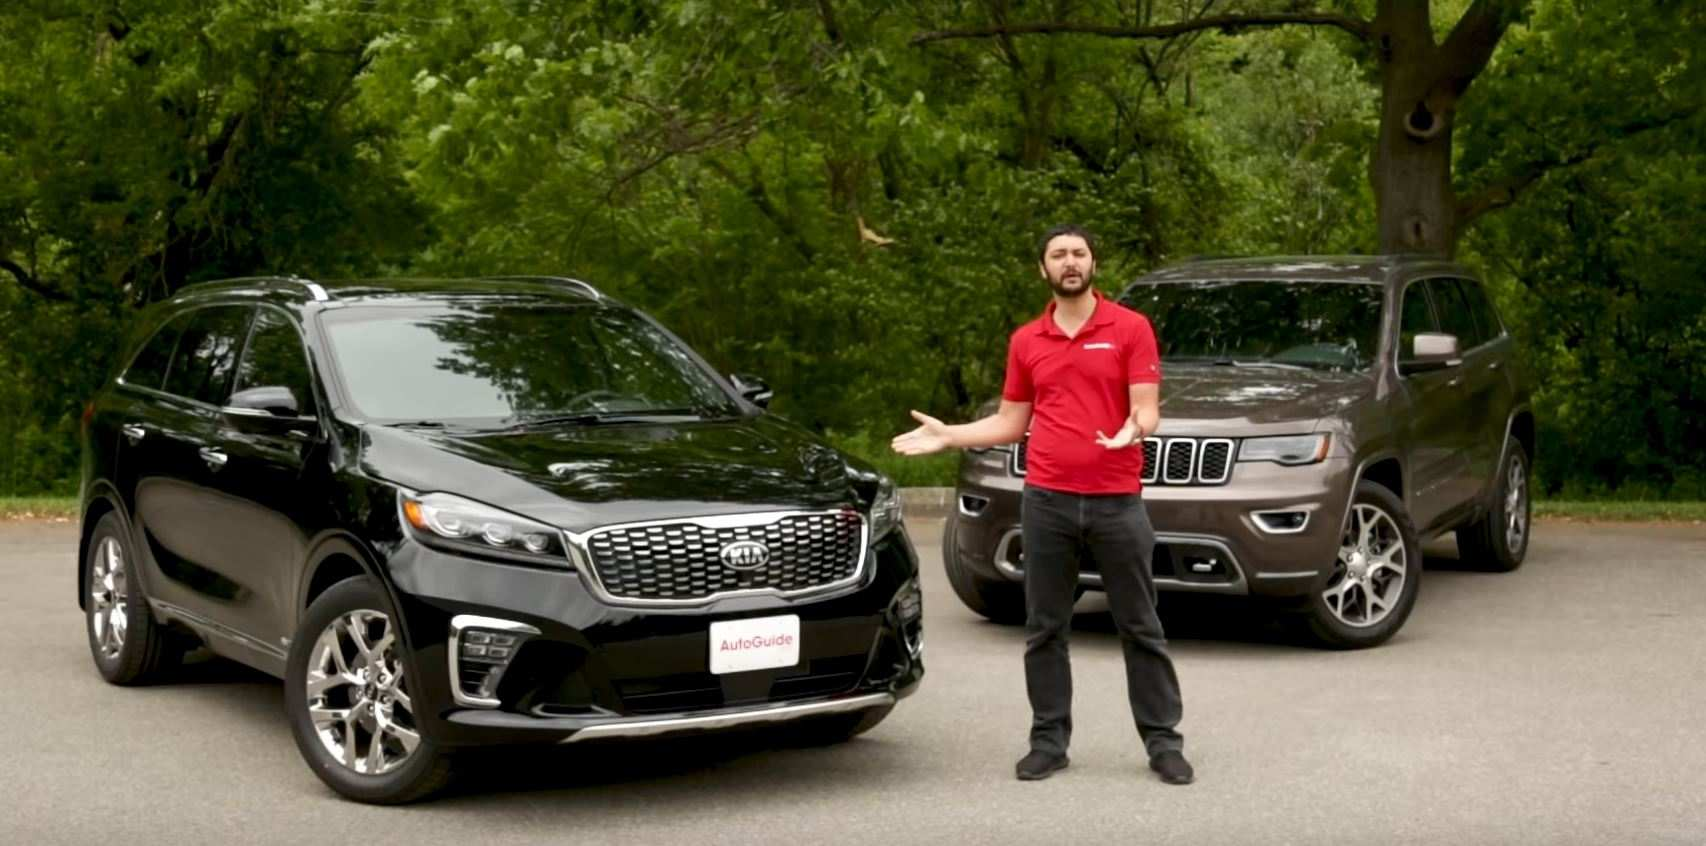 34 Gallery of The 2019 Jeep Cherokee Vs Kia Sorento New Review Rumors by The 2019 Jeep Cherokee Vs Kia Sorento New Review